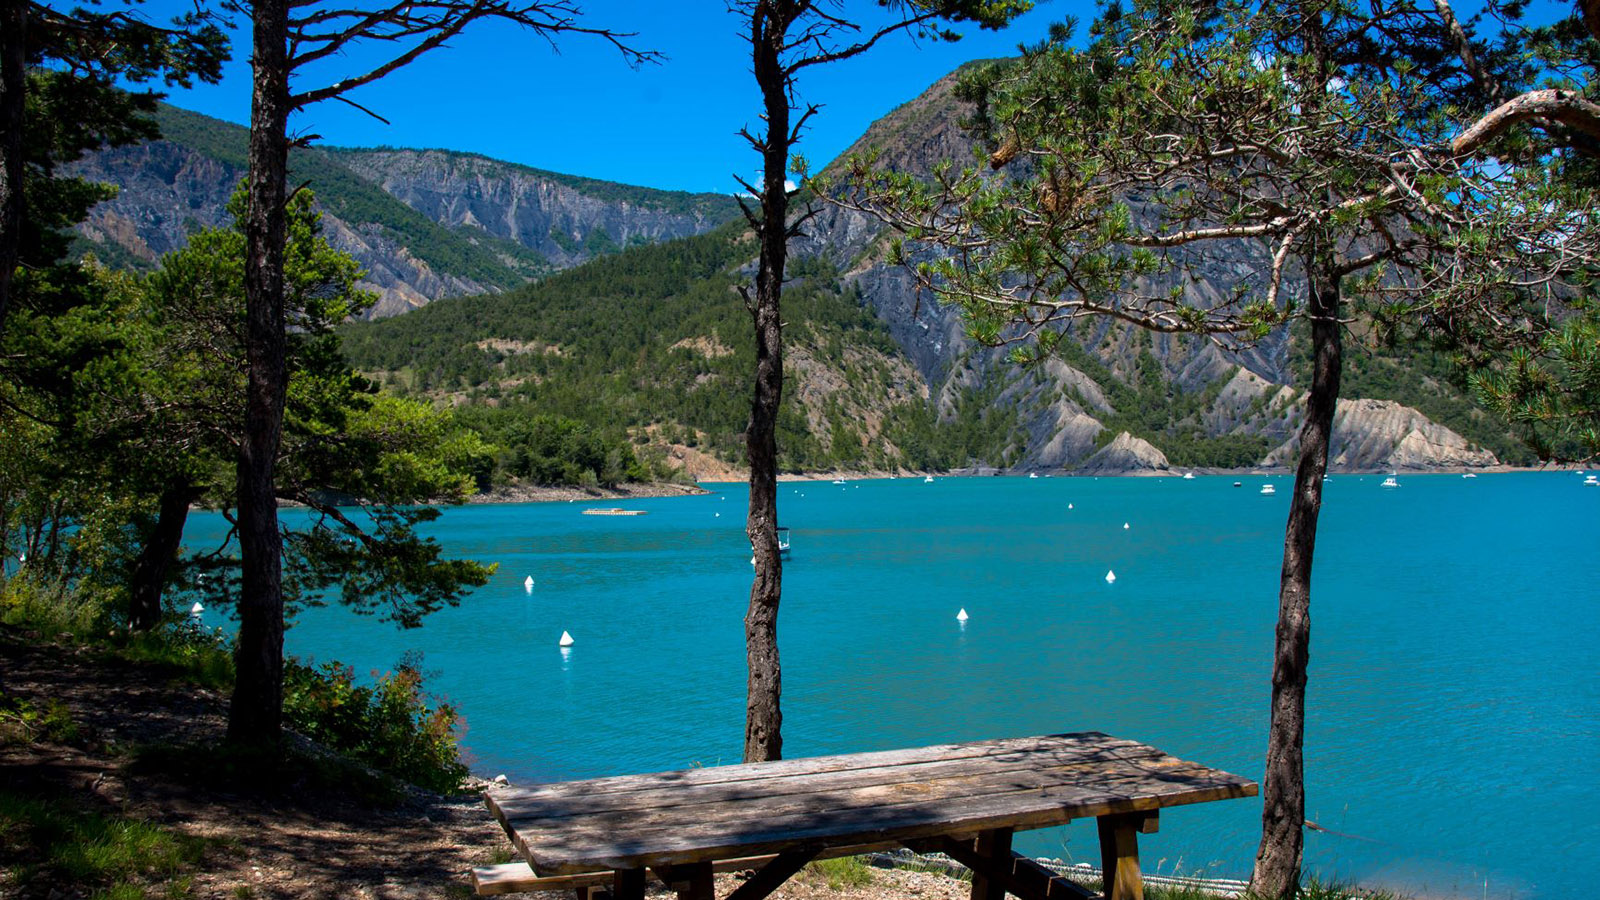 Lac de Serre-Ponçon. Foto: Hilke Maunder